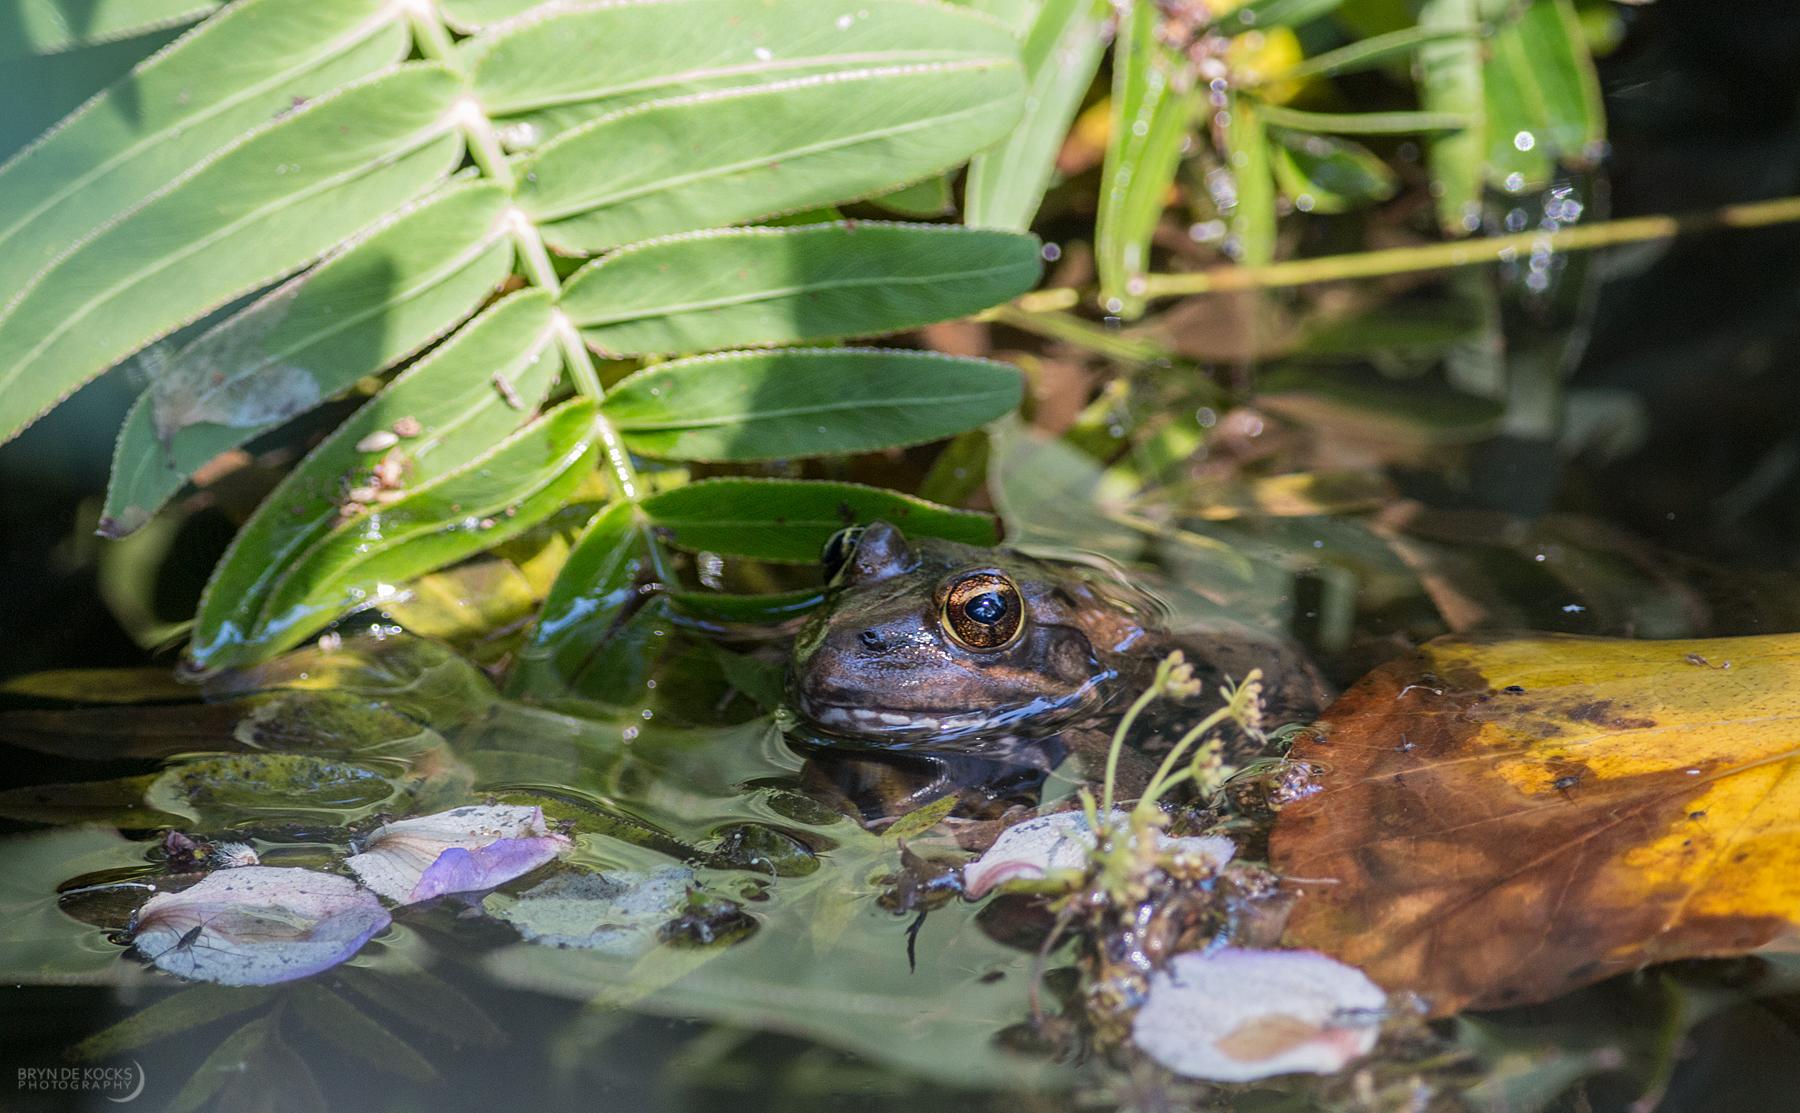 frog-kirstinbosch